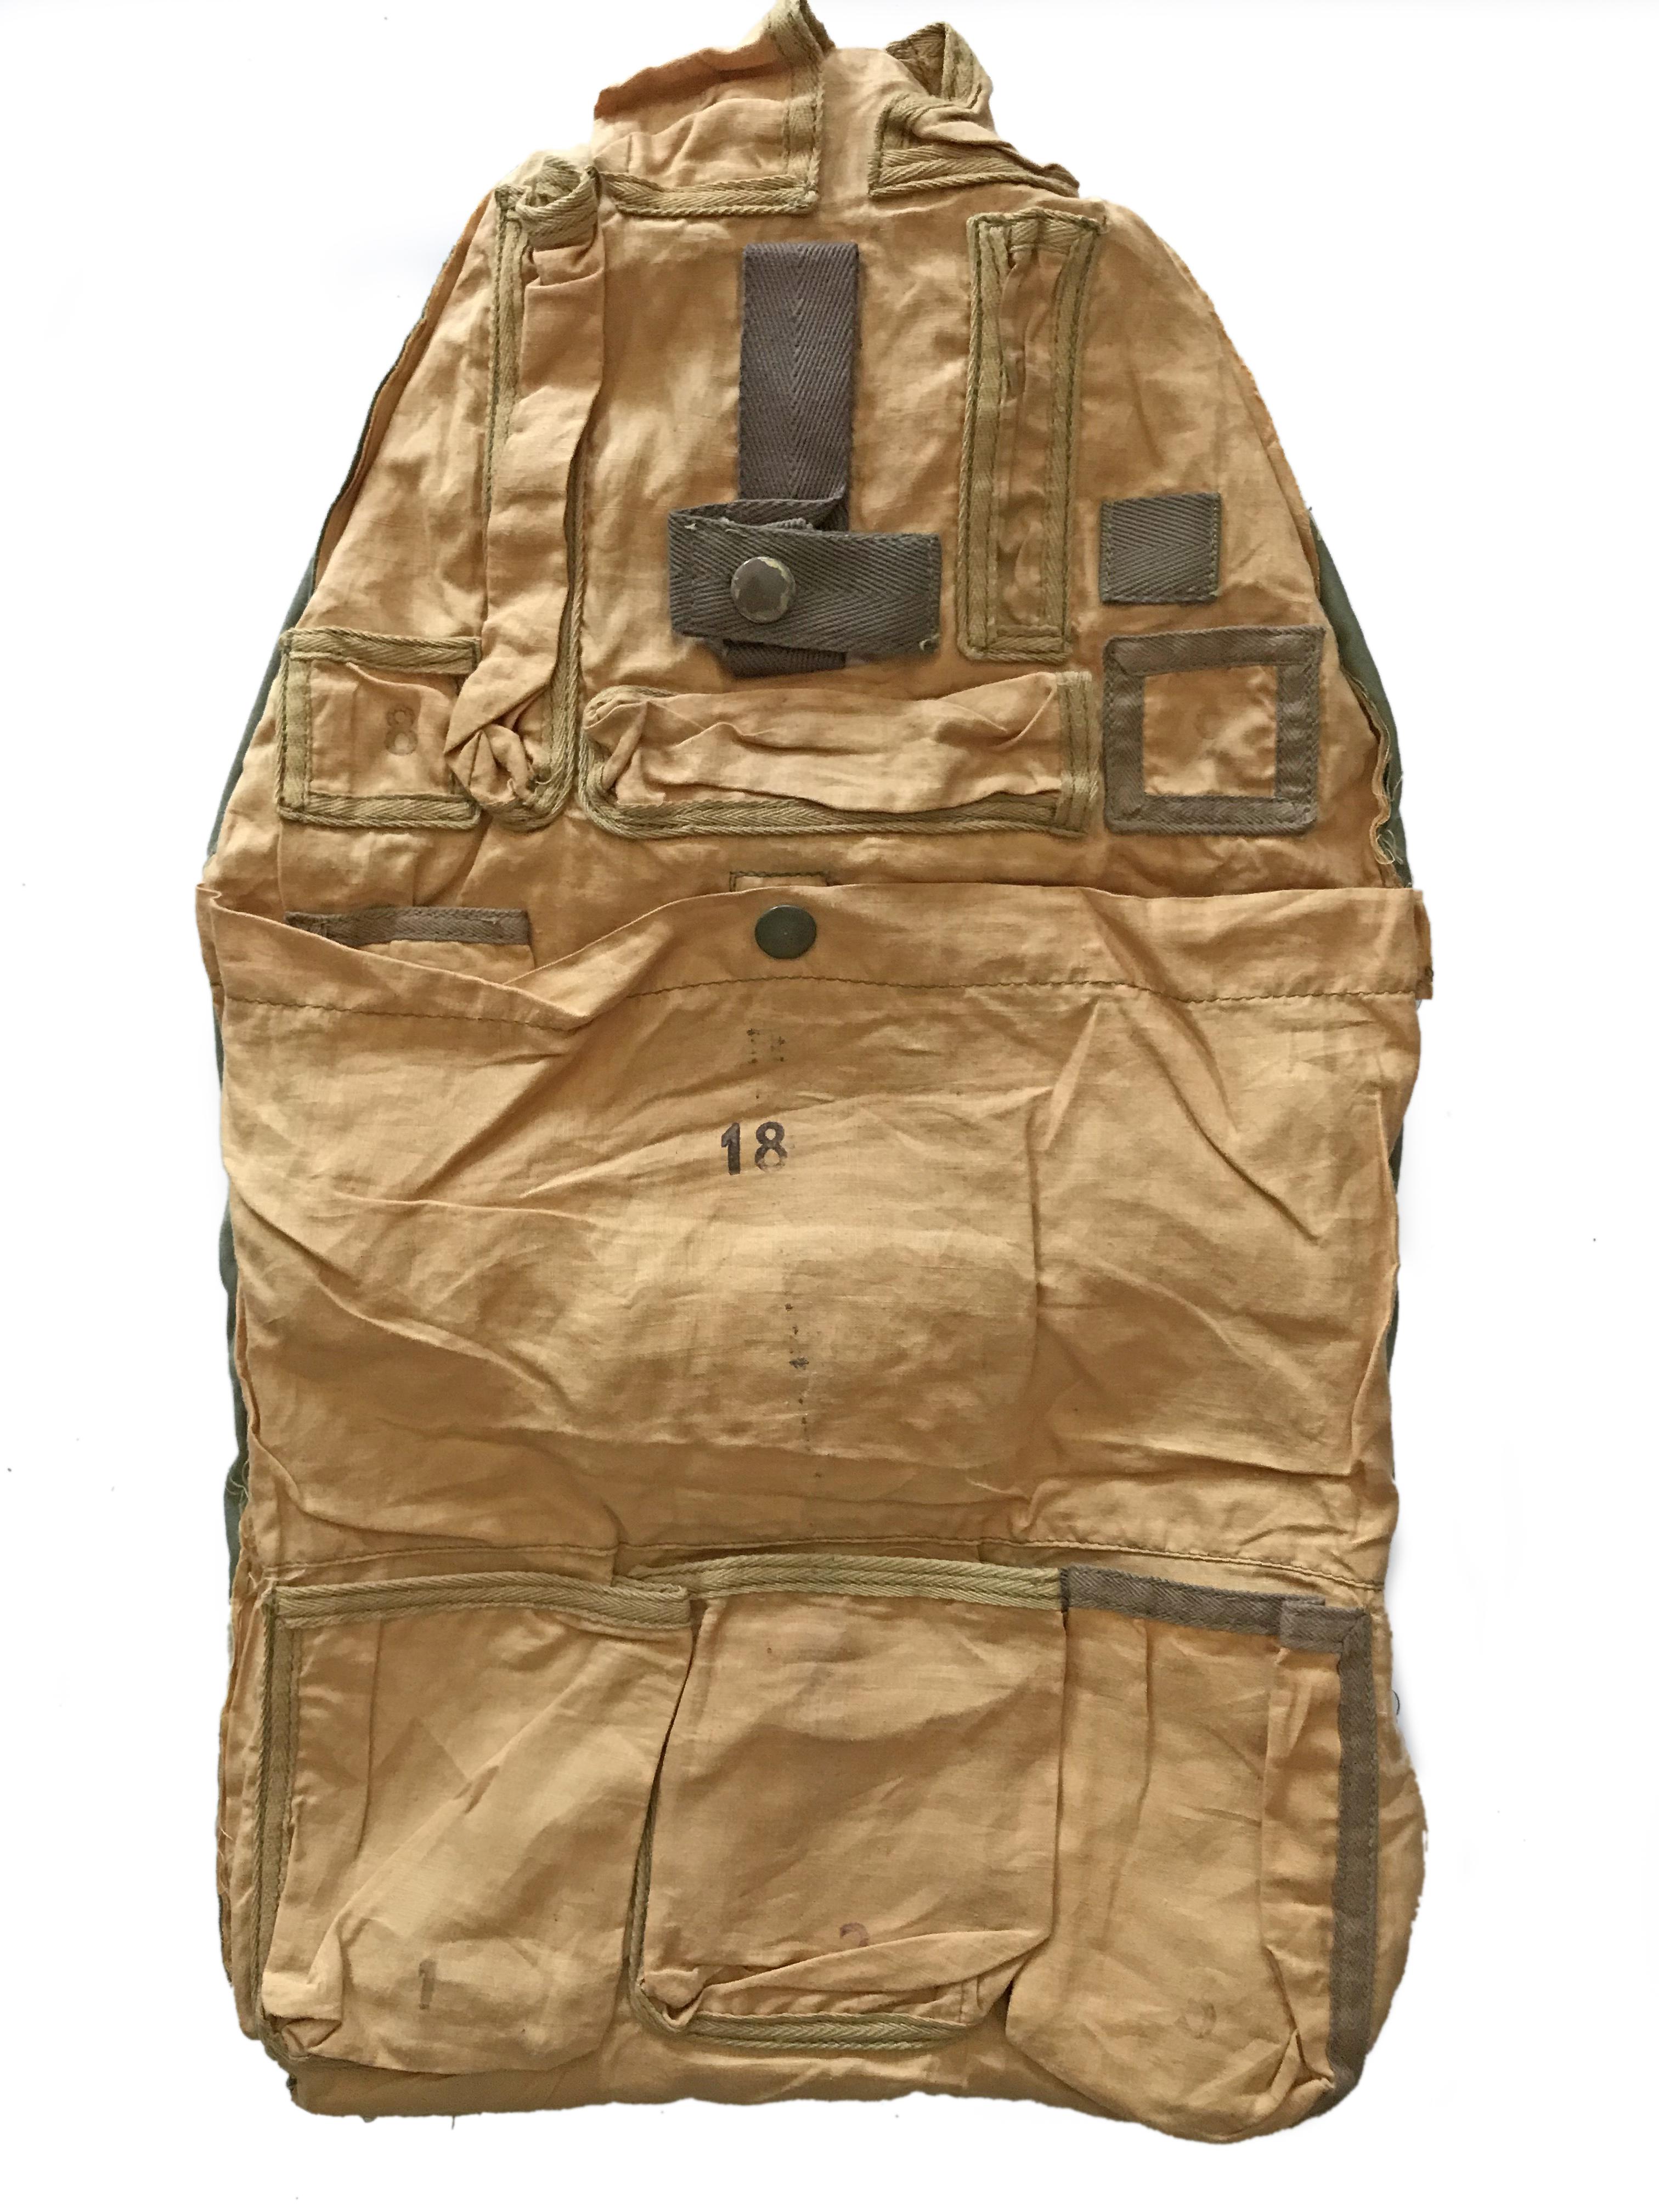 RAF Tropical backpack survival kit